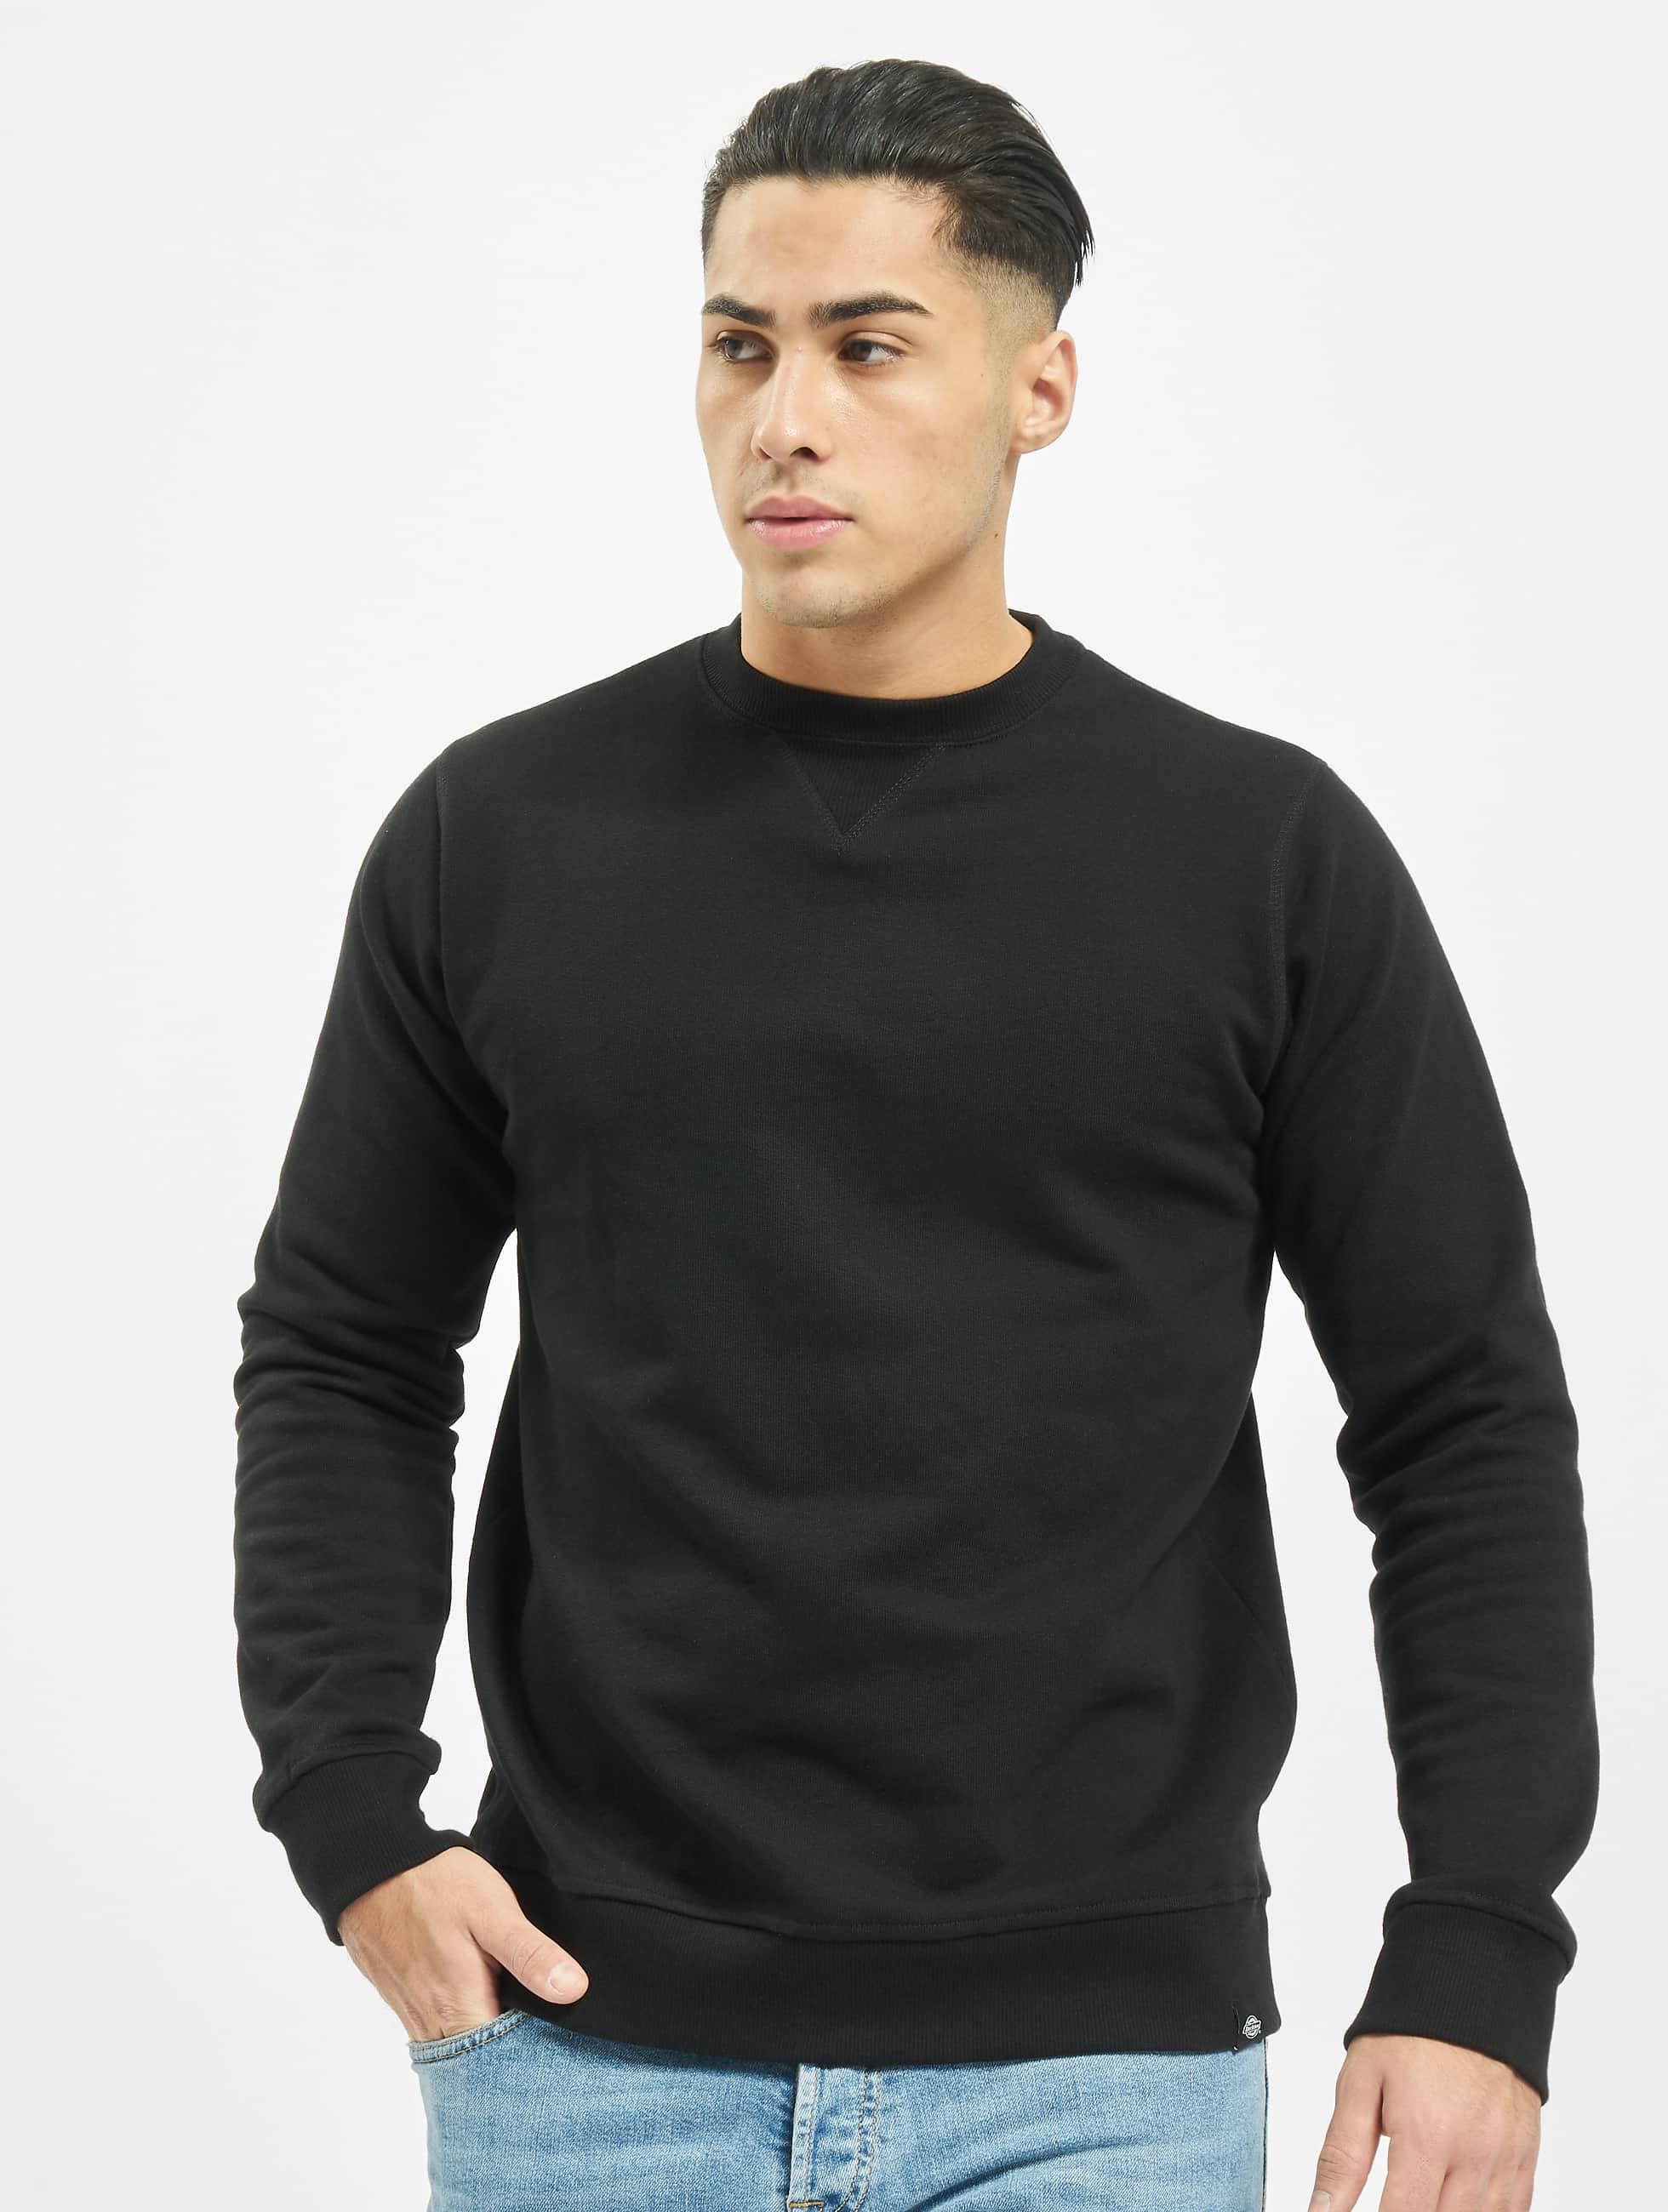 Dickies Men/'S Washington Long Sleeve Sweatshirt